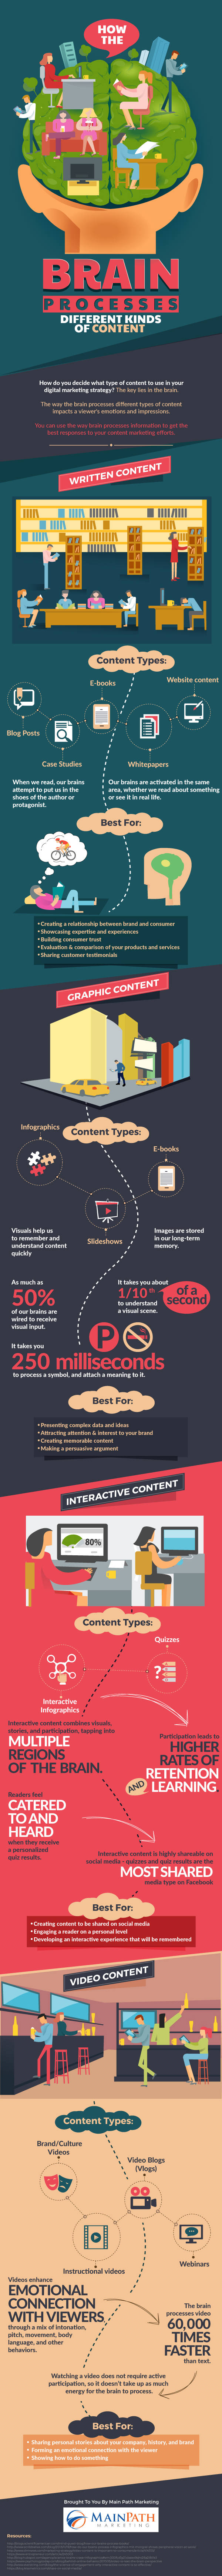 Infographic - hoe reageert ons brein op content marketing